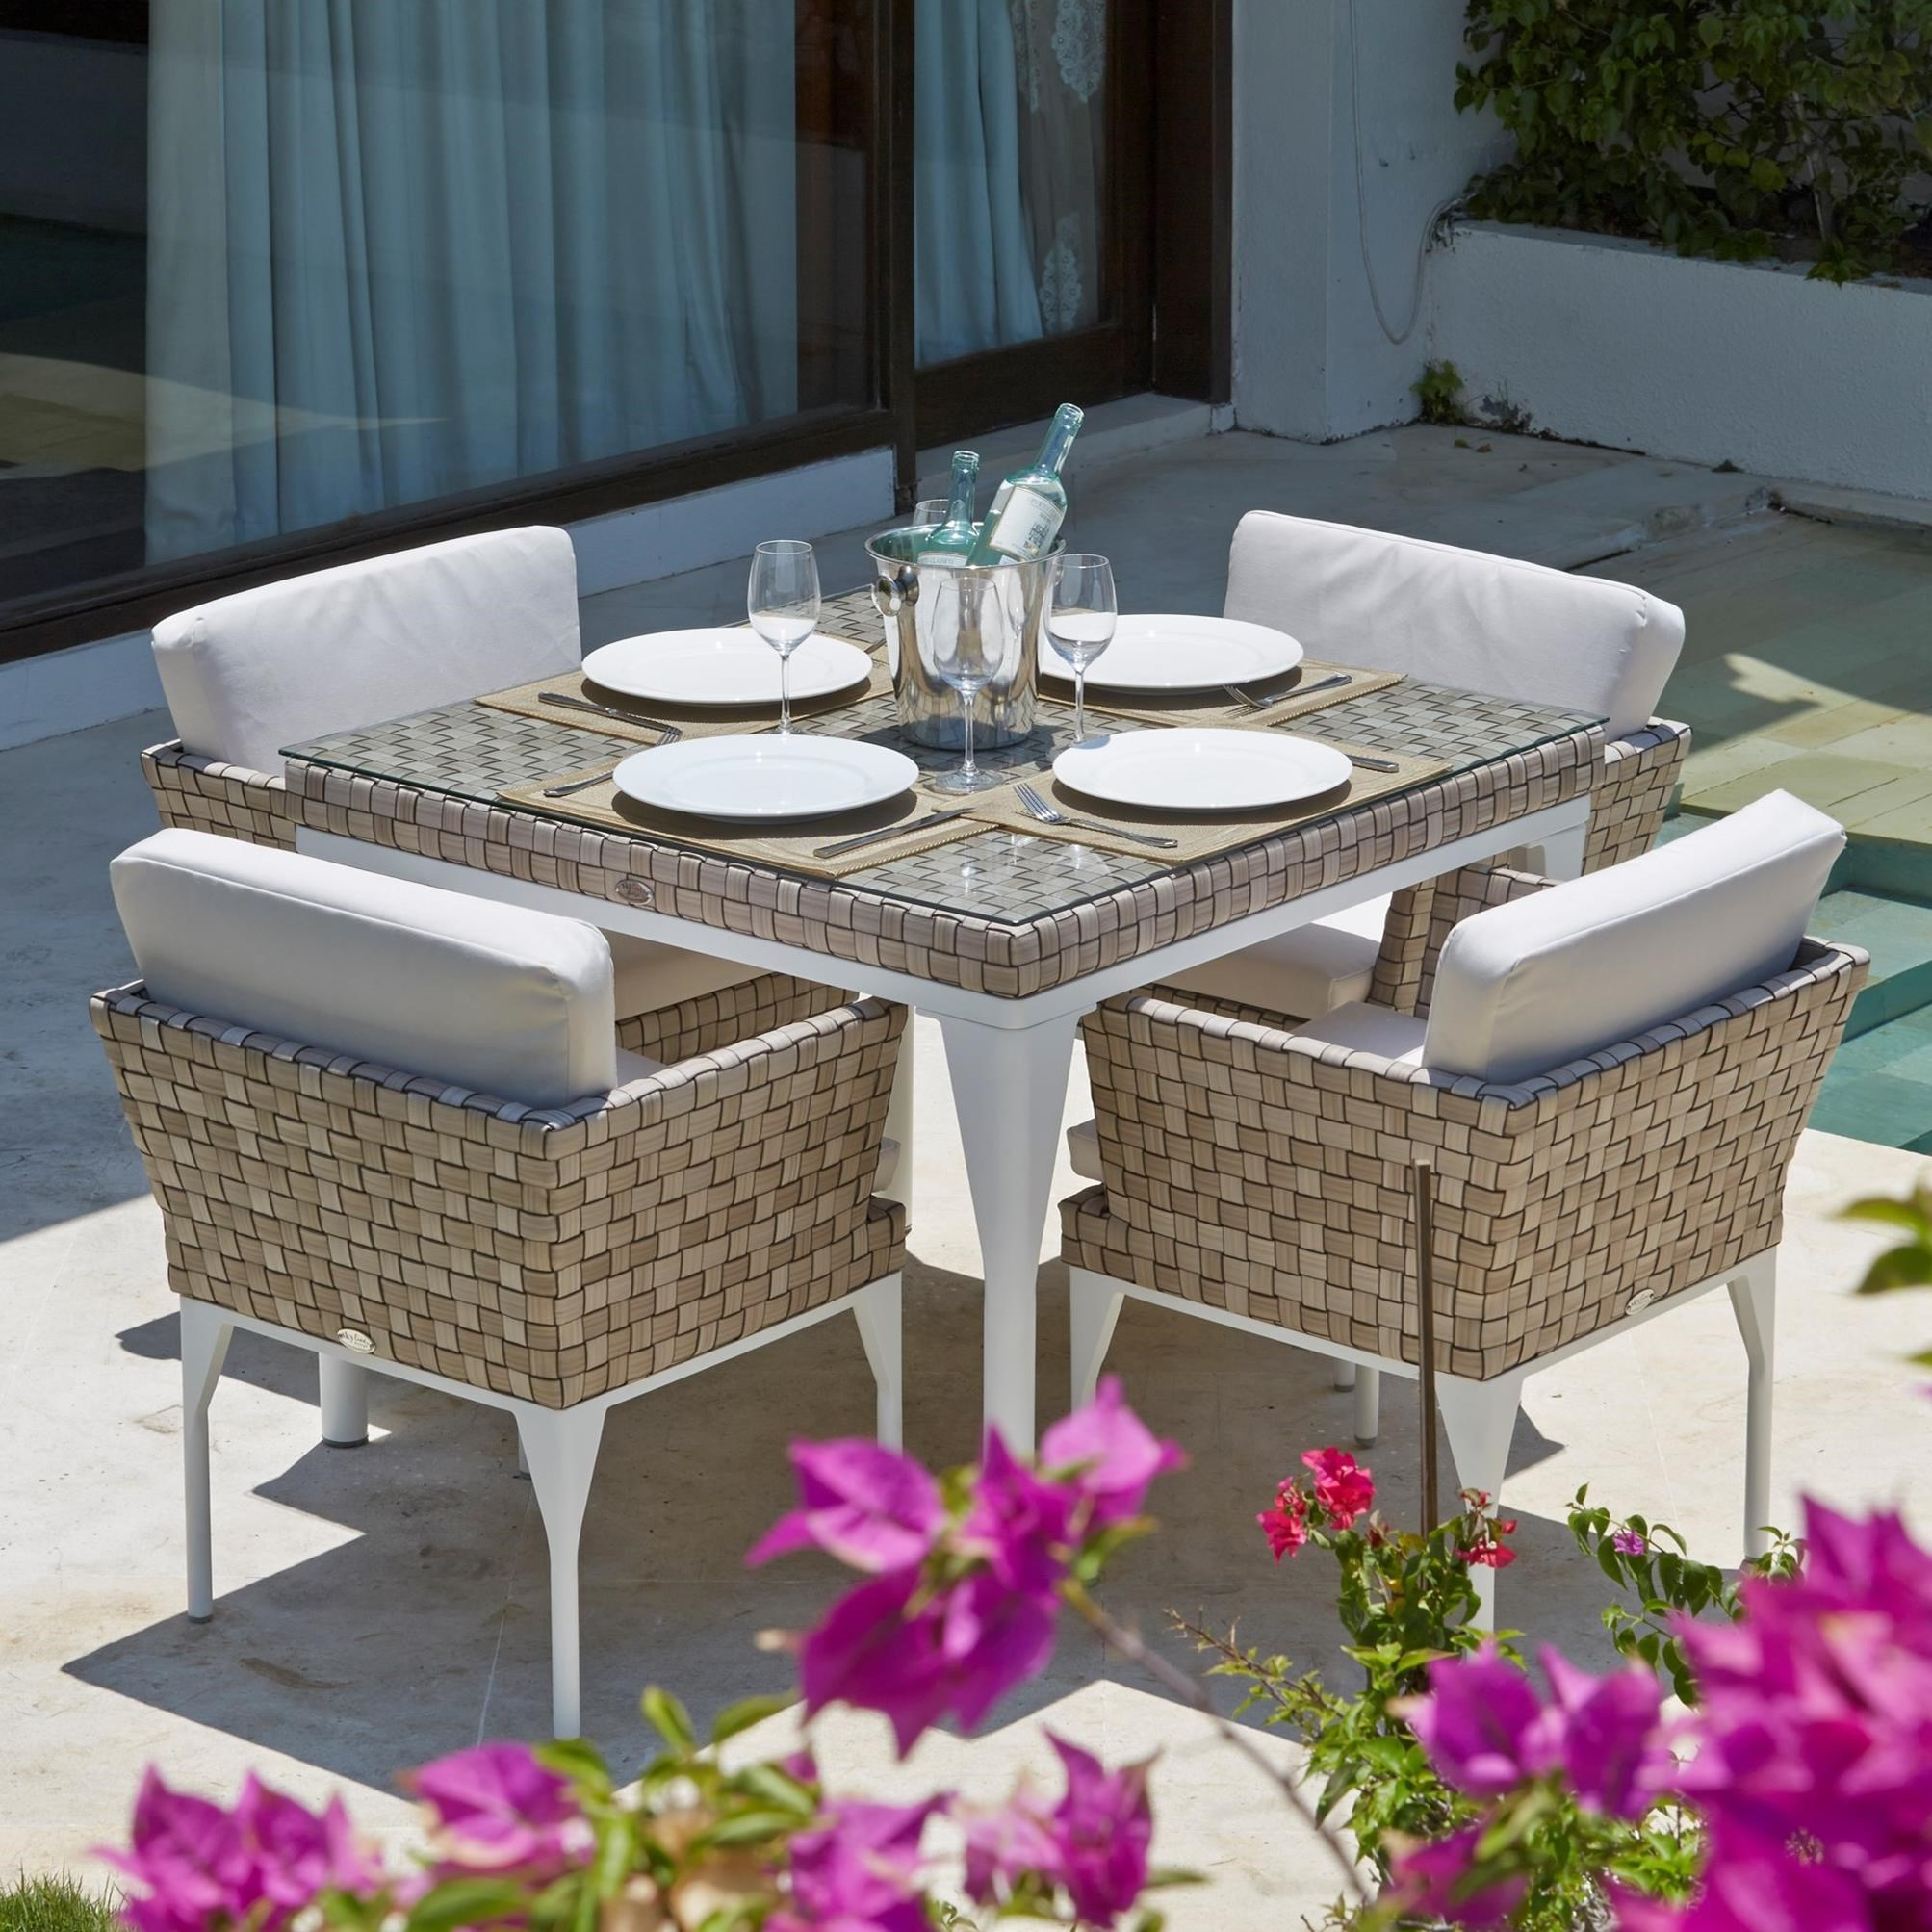 Skyline Design BRAFTA 5 Piece Outdoor Dining Set | Baer's ...